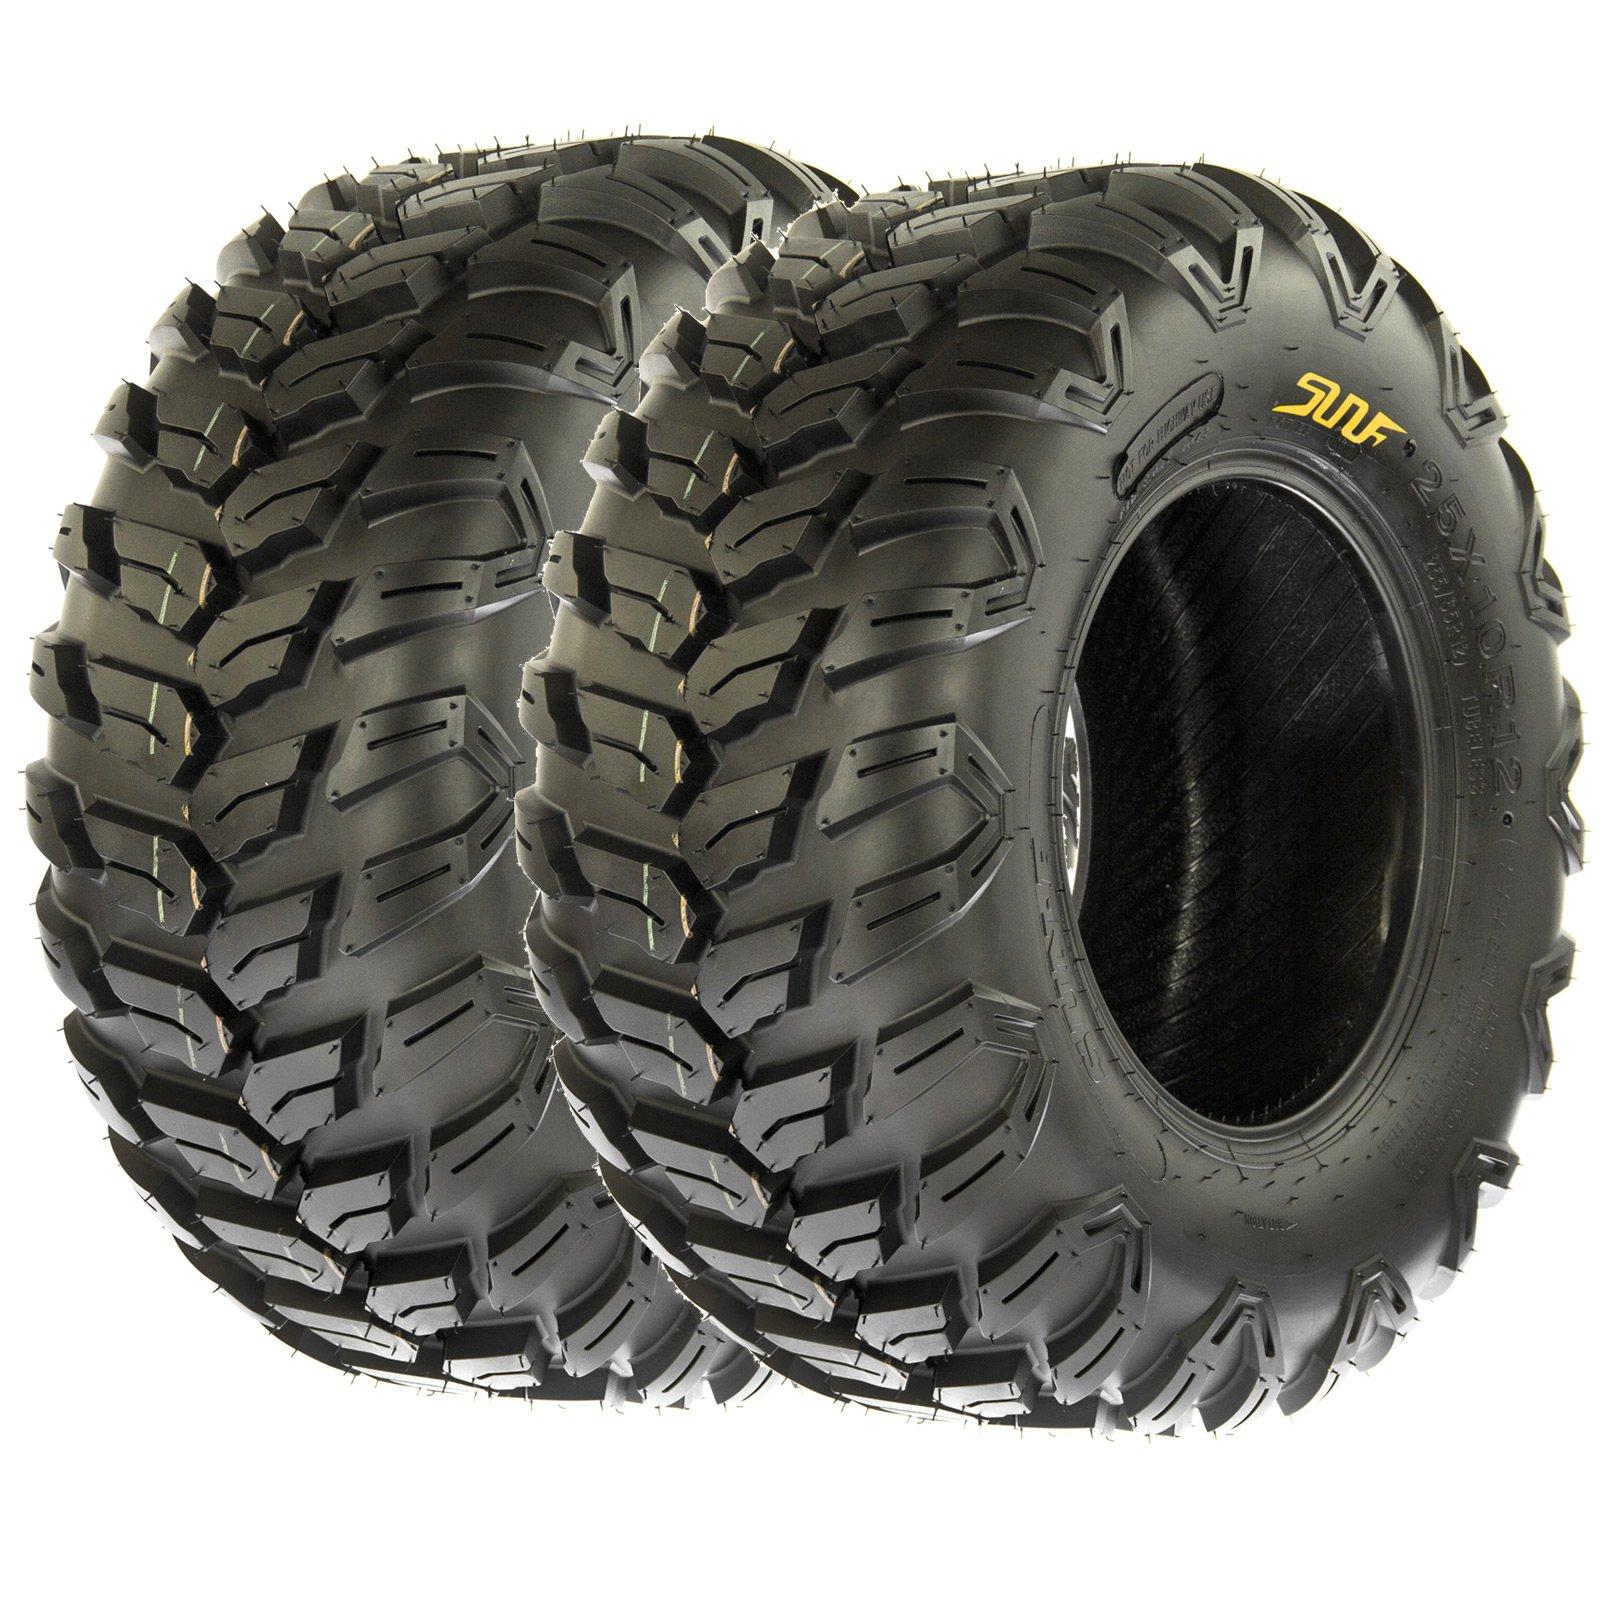 SunF All Terrain Radial ATV UTV Tires 26x11R-14 26x11x14 6 PR A043 (Set pair of 2)